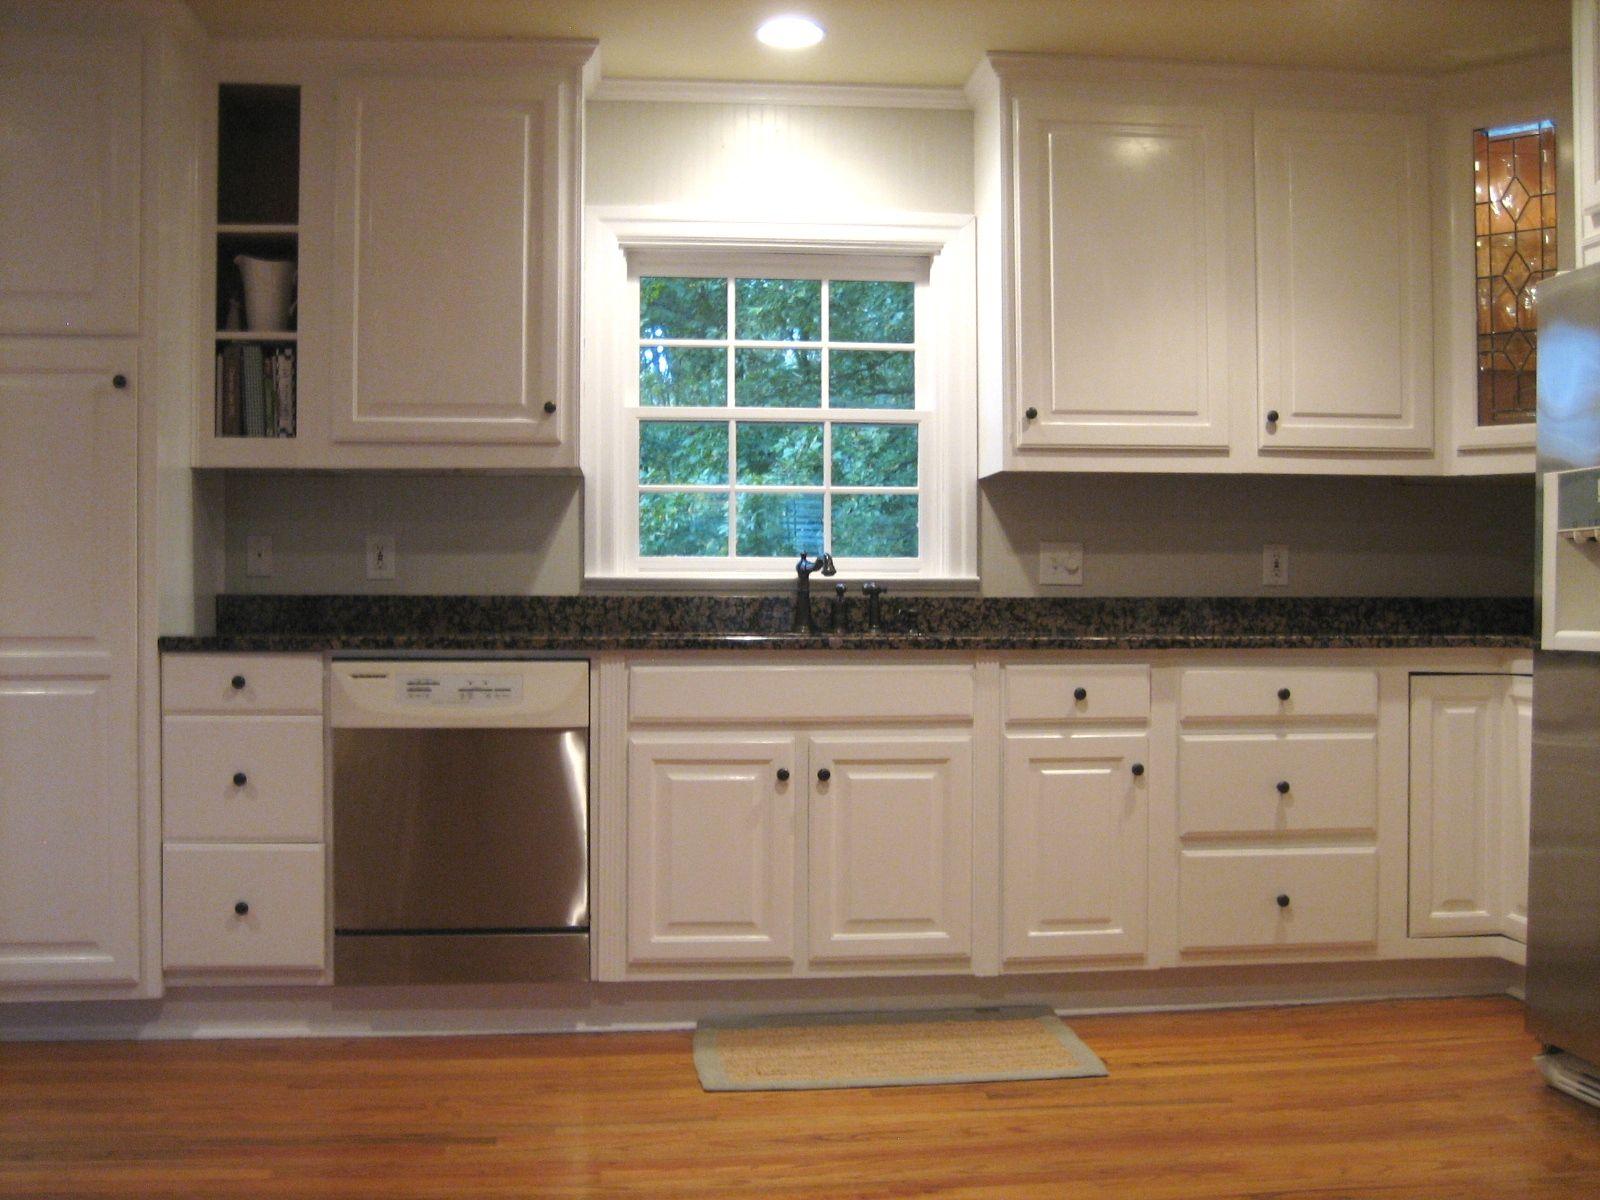 Google Image Result For Http 3 Bp Blogspot Com Aue8isv0hb4 Tmbr1ykvgmi Aaaaaaaa Shabby Chic Kitchen Cabinets Cheap Kitchen Cabinets Modern Kitchen Cupboards